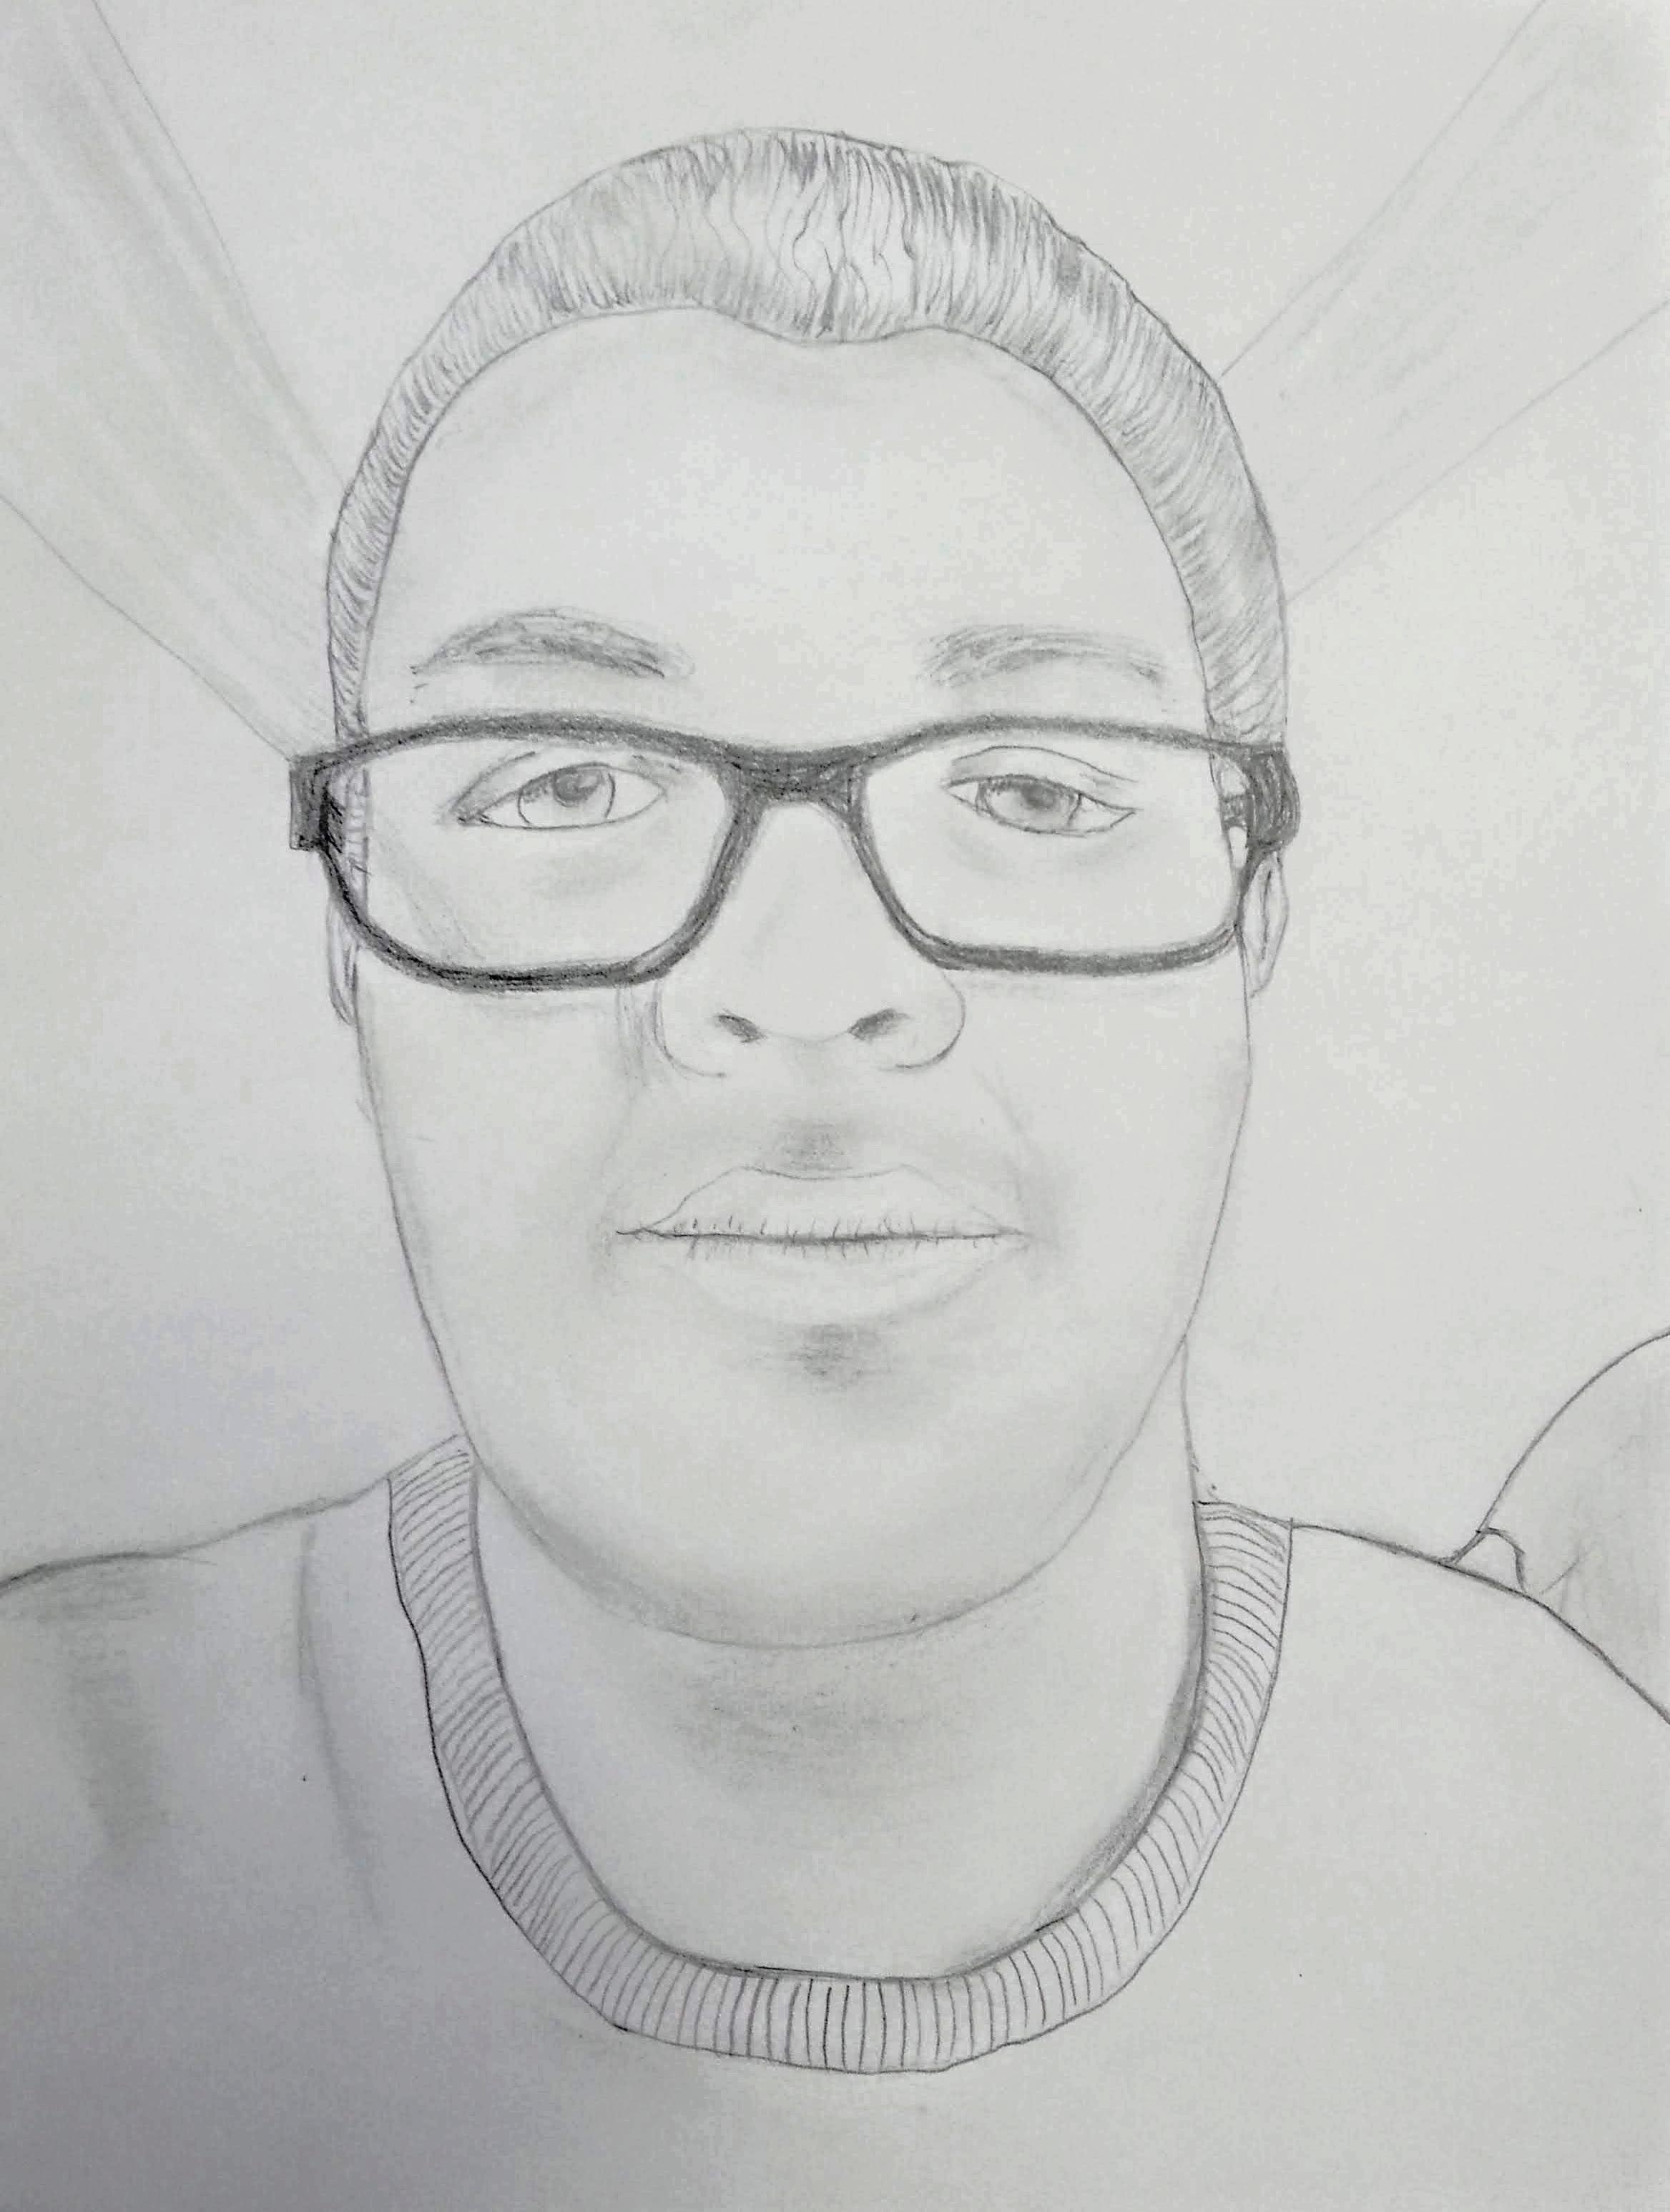 Julio_pencil.jpg